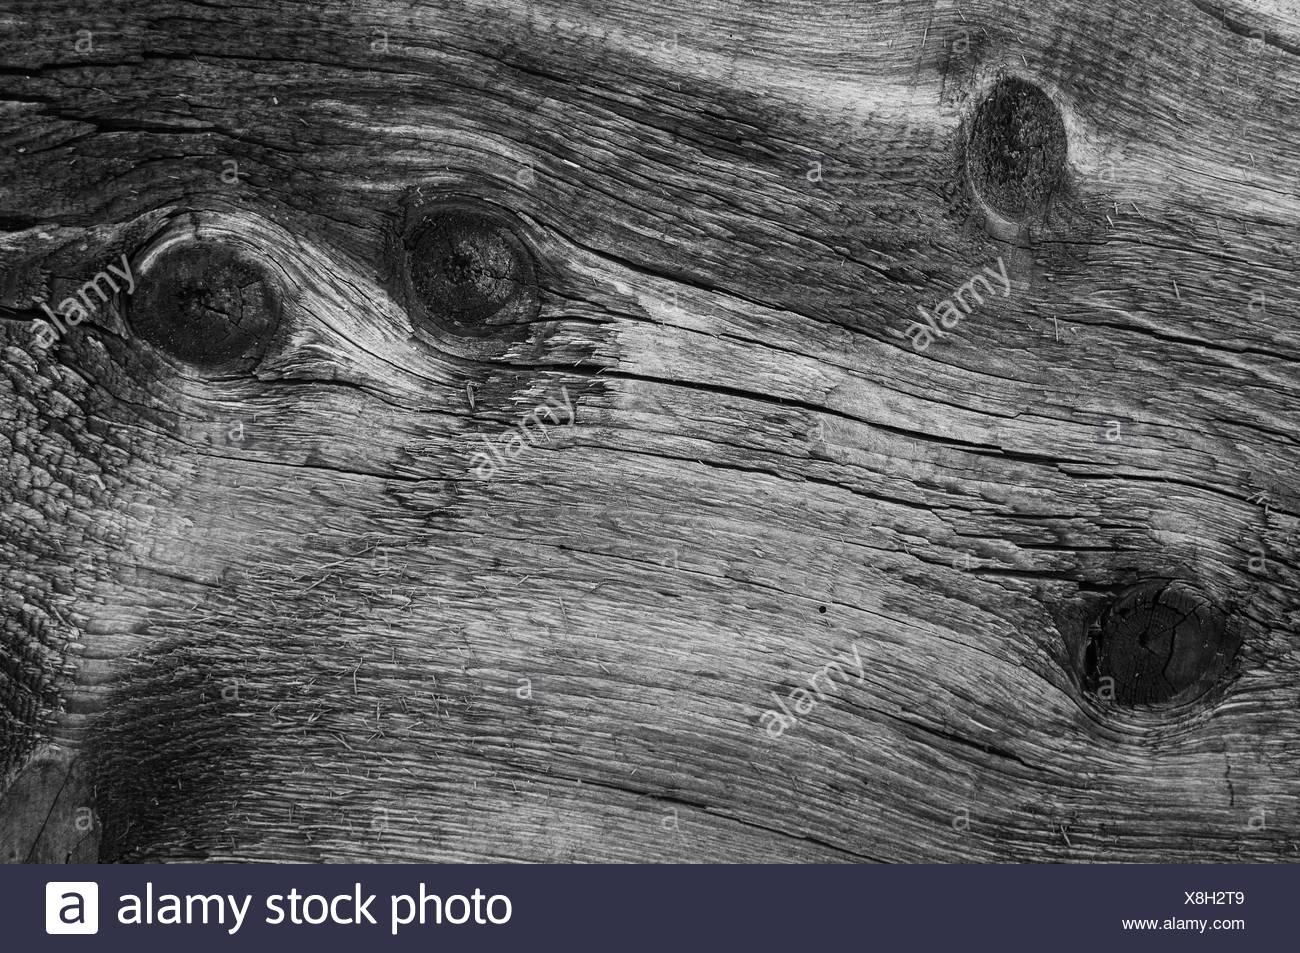 Old wood texture, vintage natural background - Stock Image